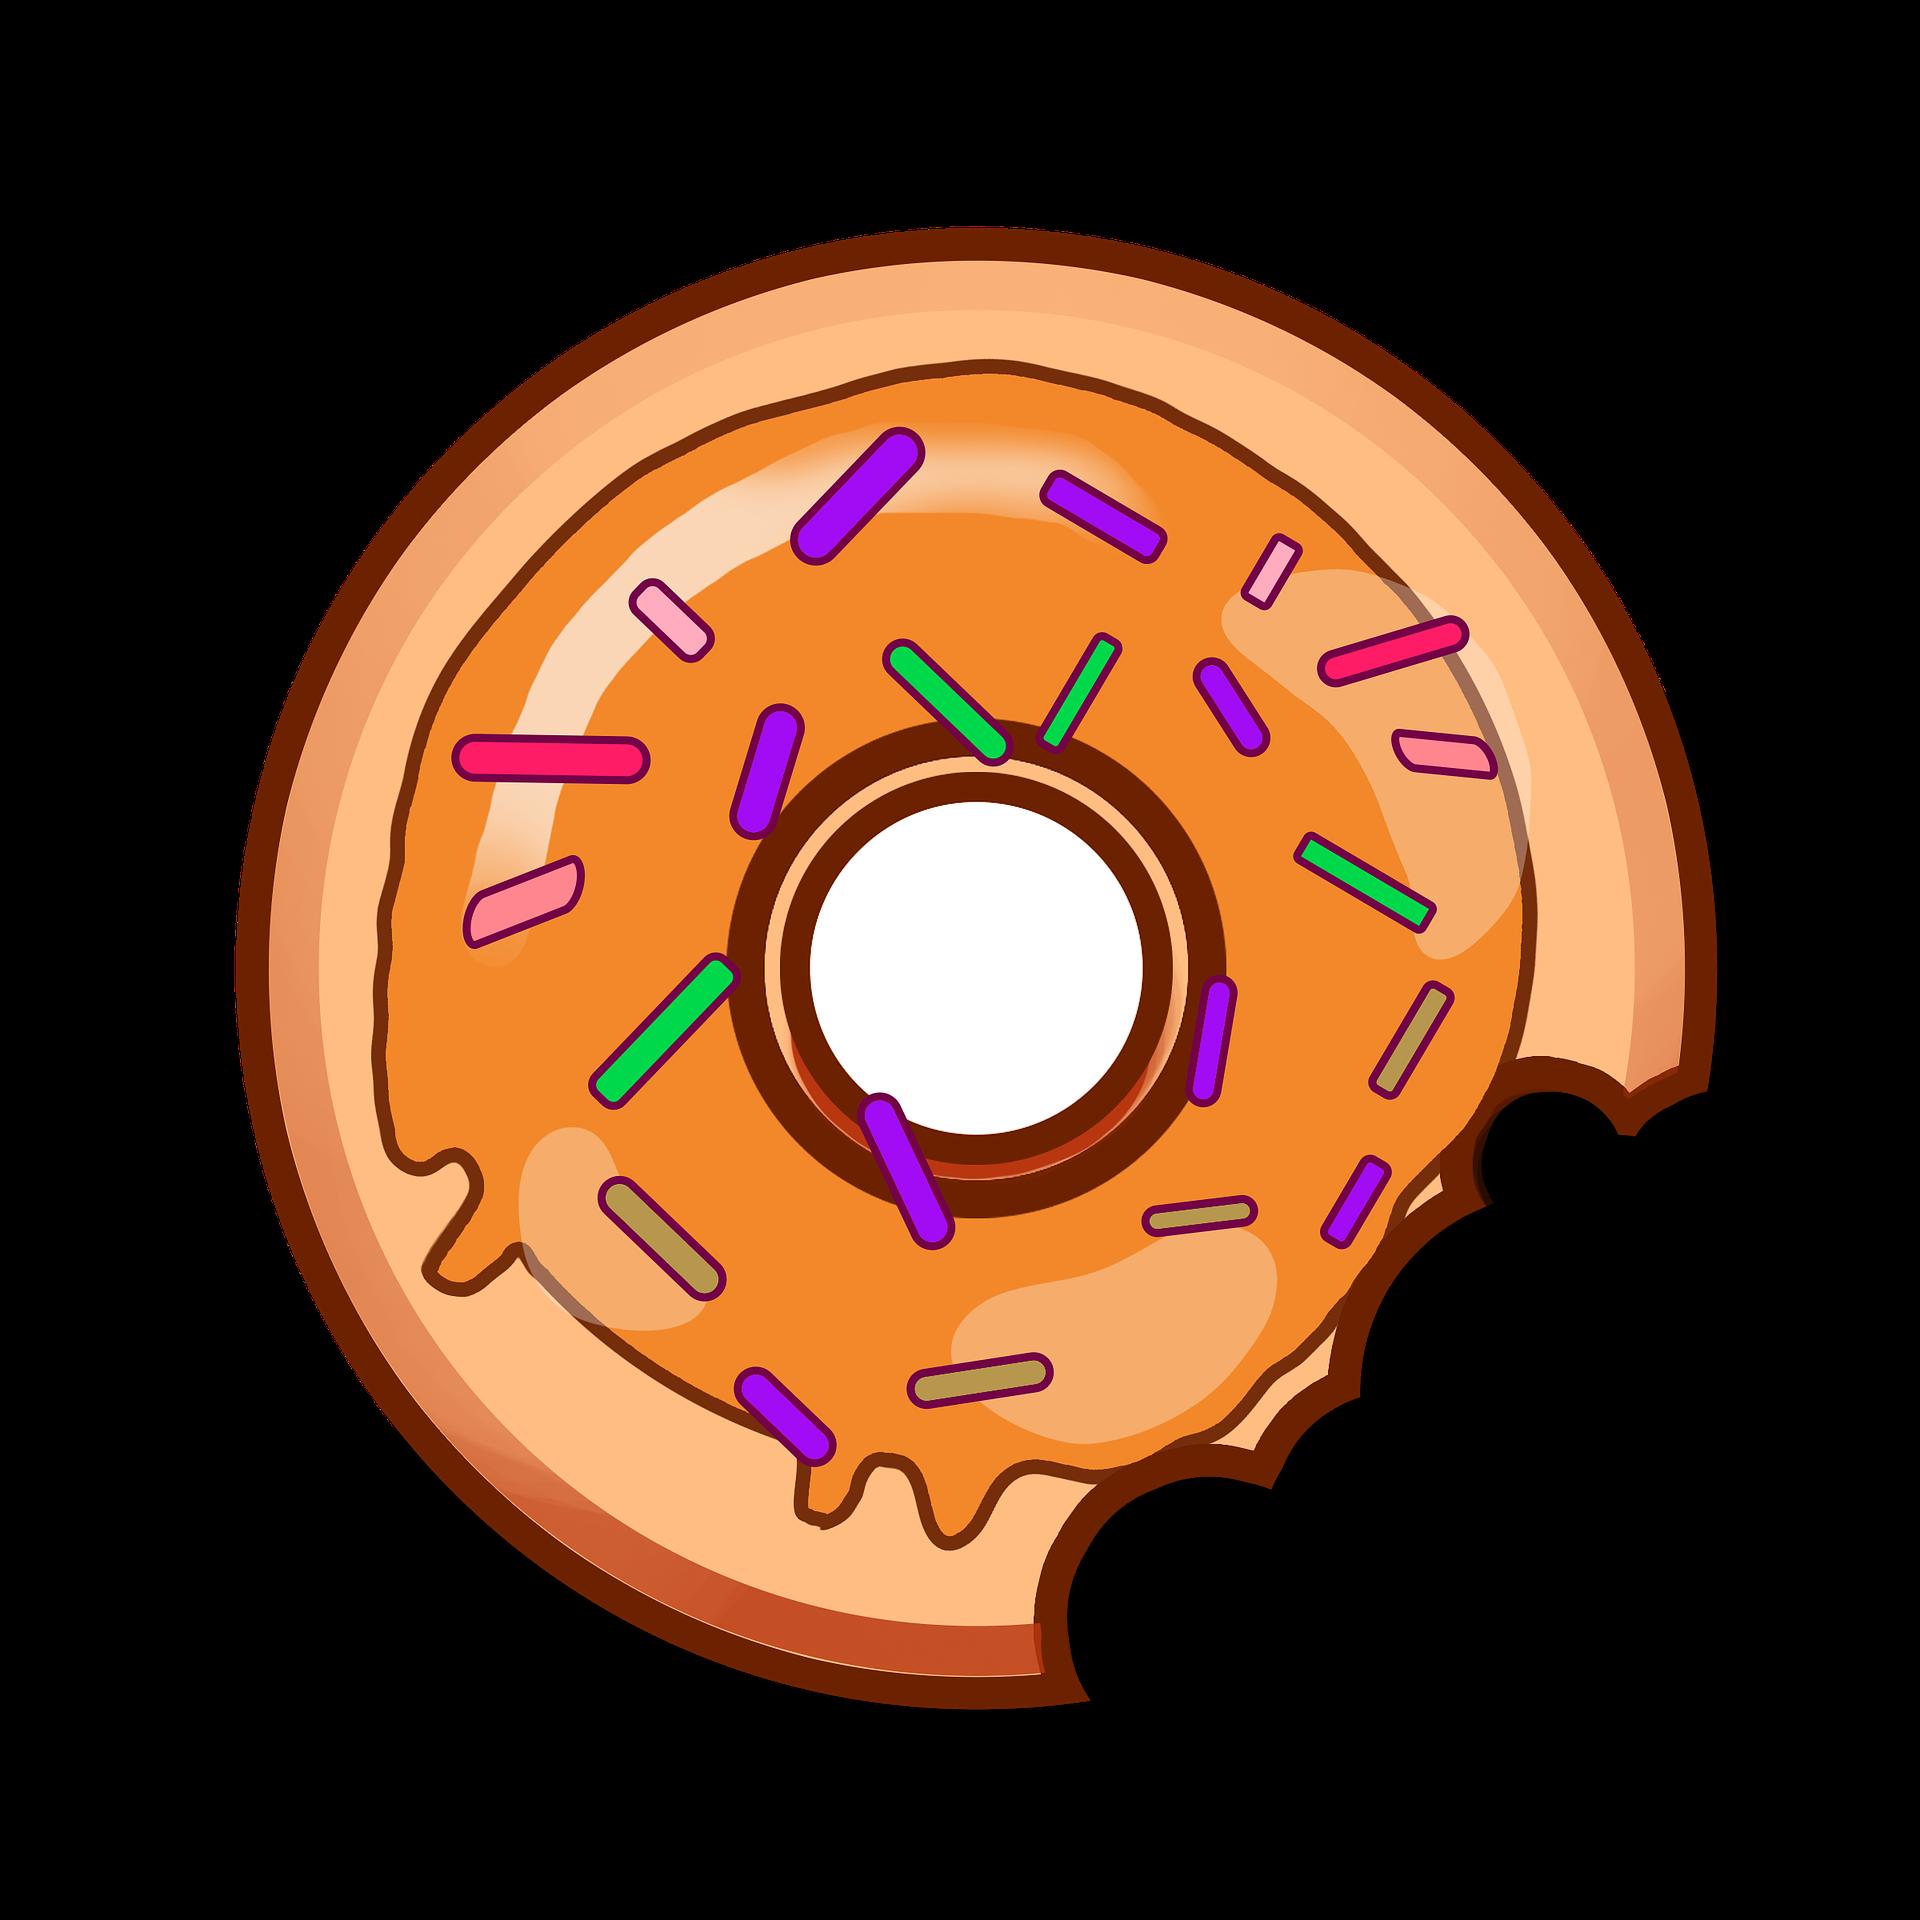 Shop clipart donut, Shop donut Transparent FREE for download.